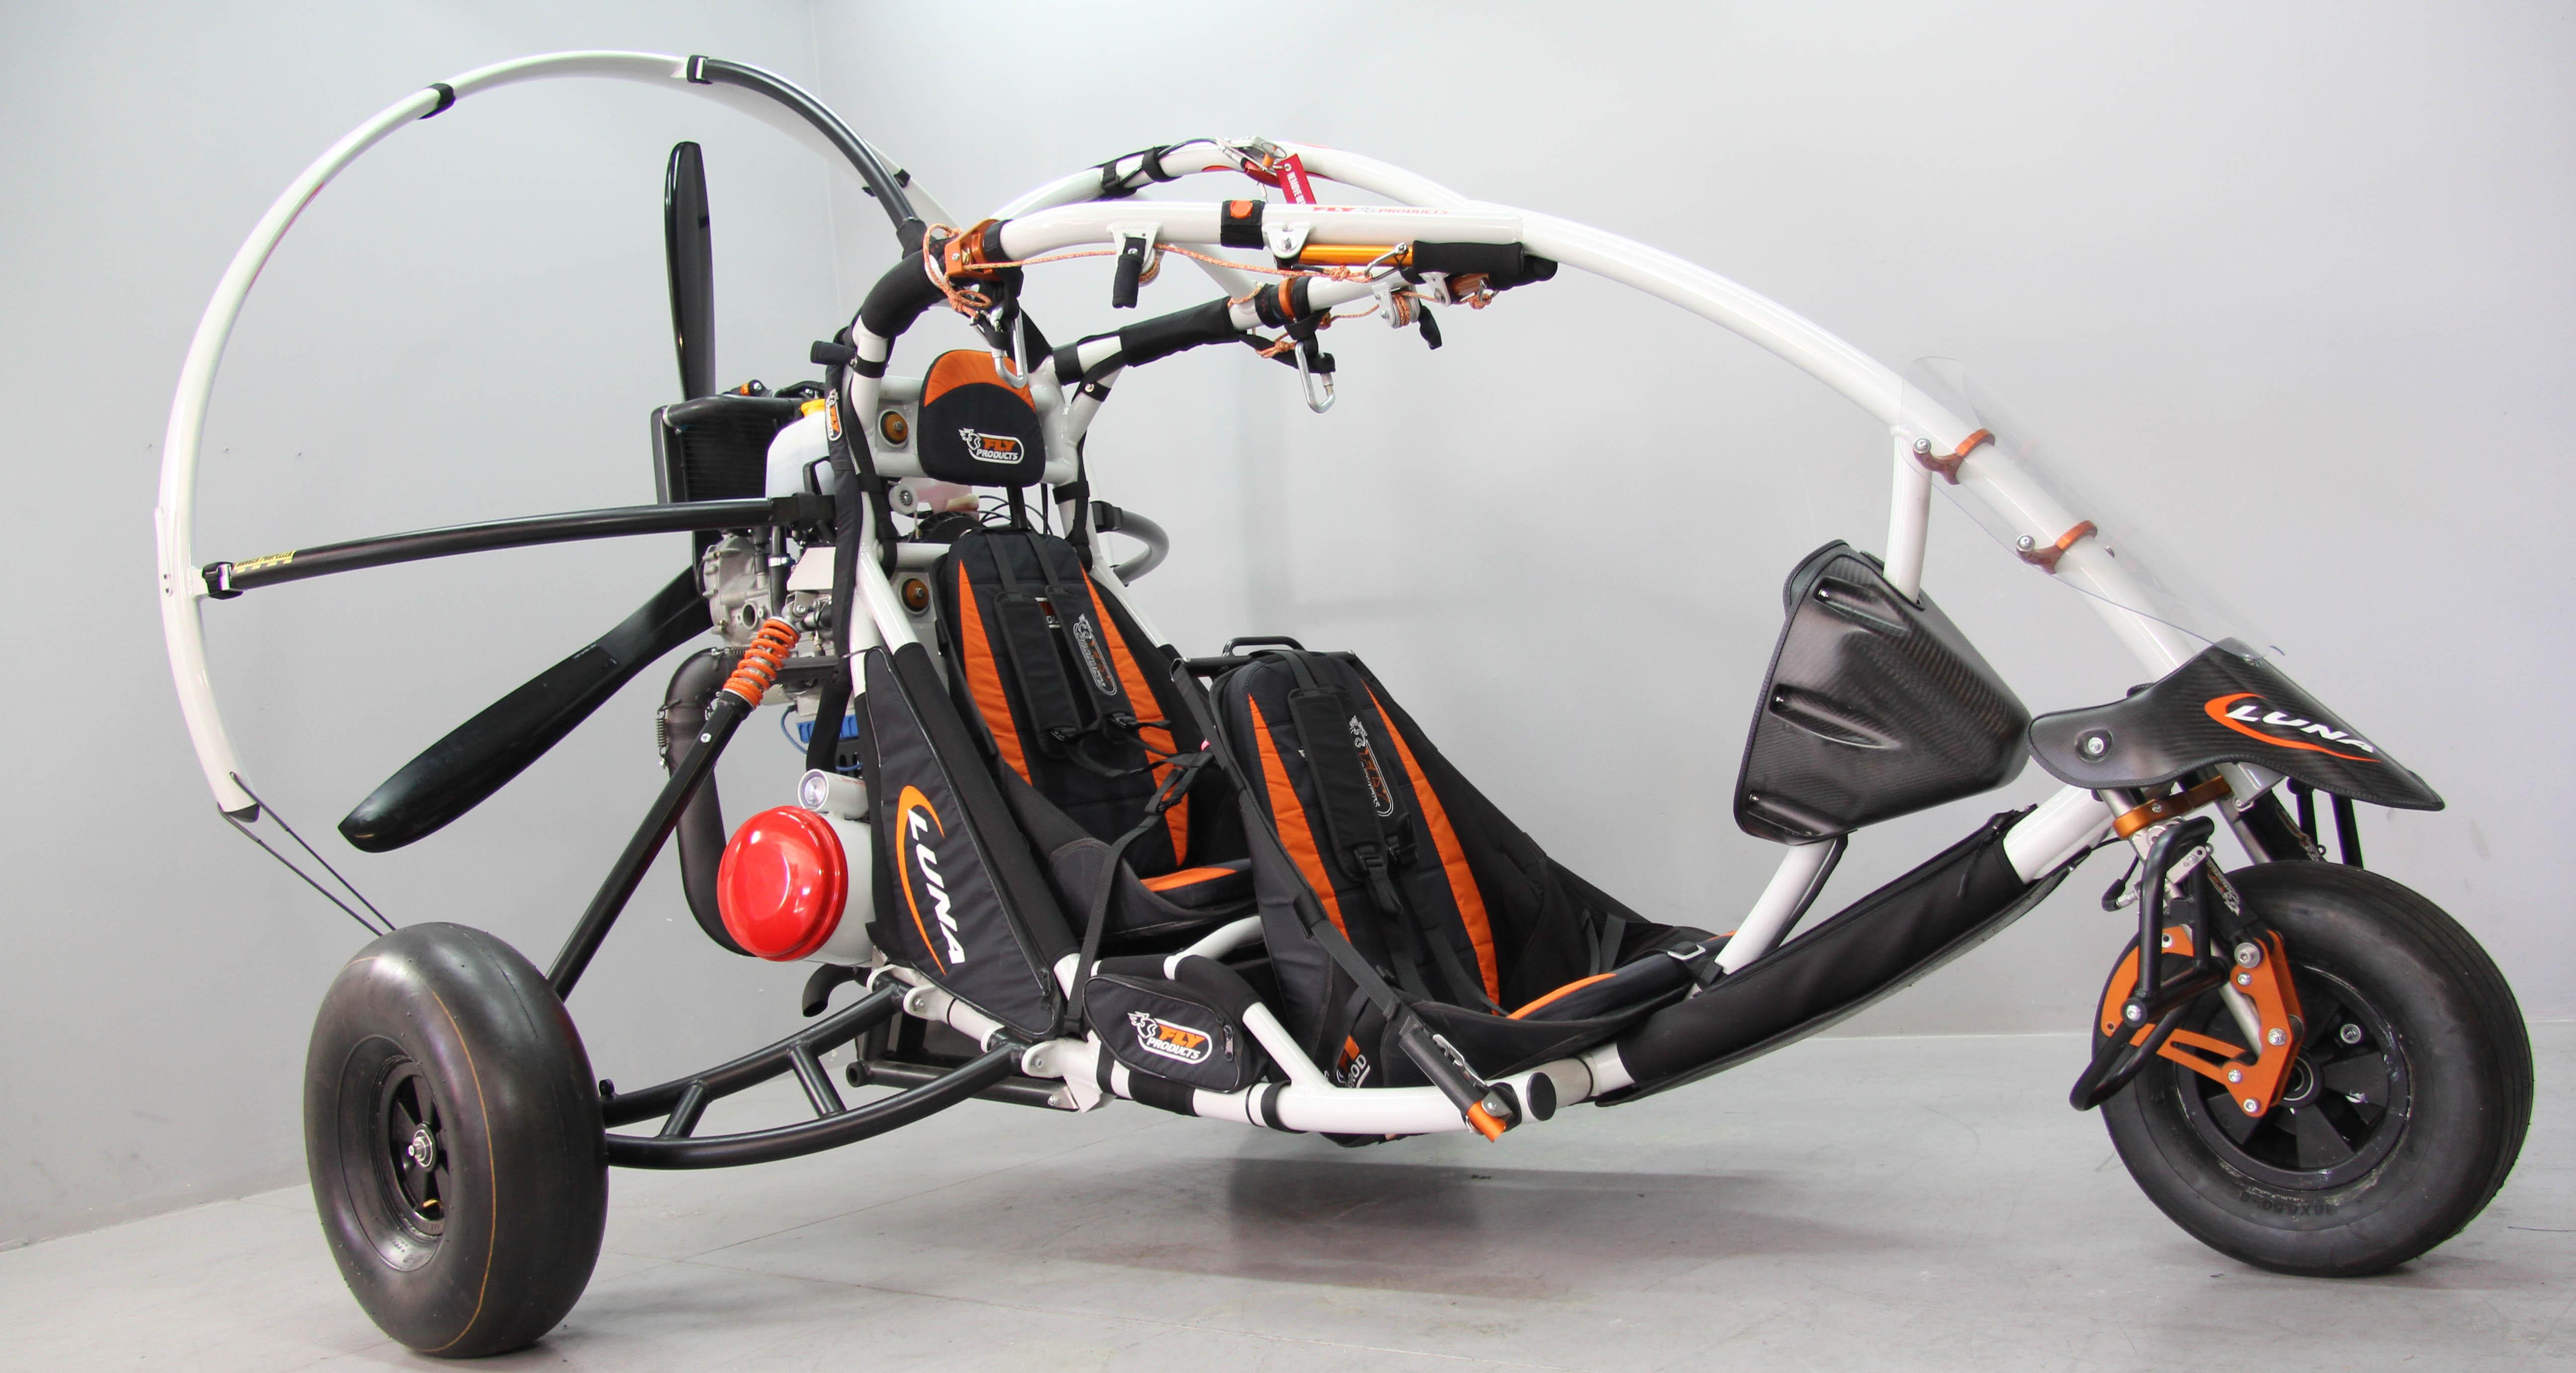 Blog - Luna Trike - Taking you higher